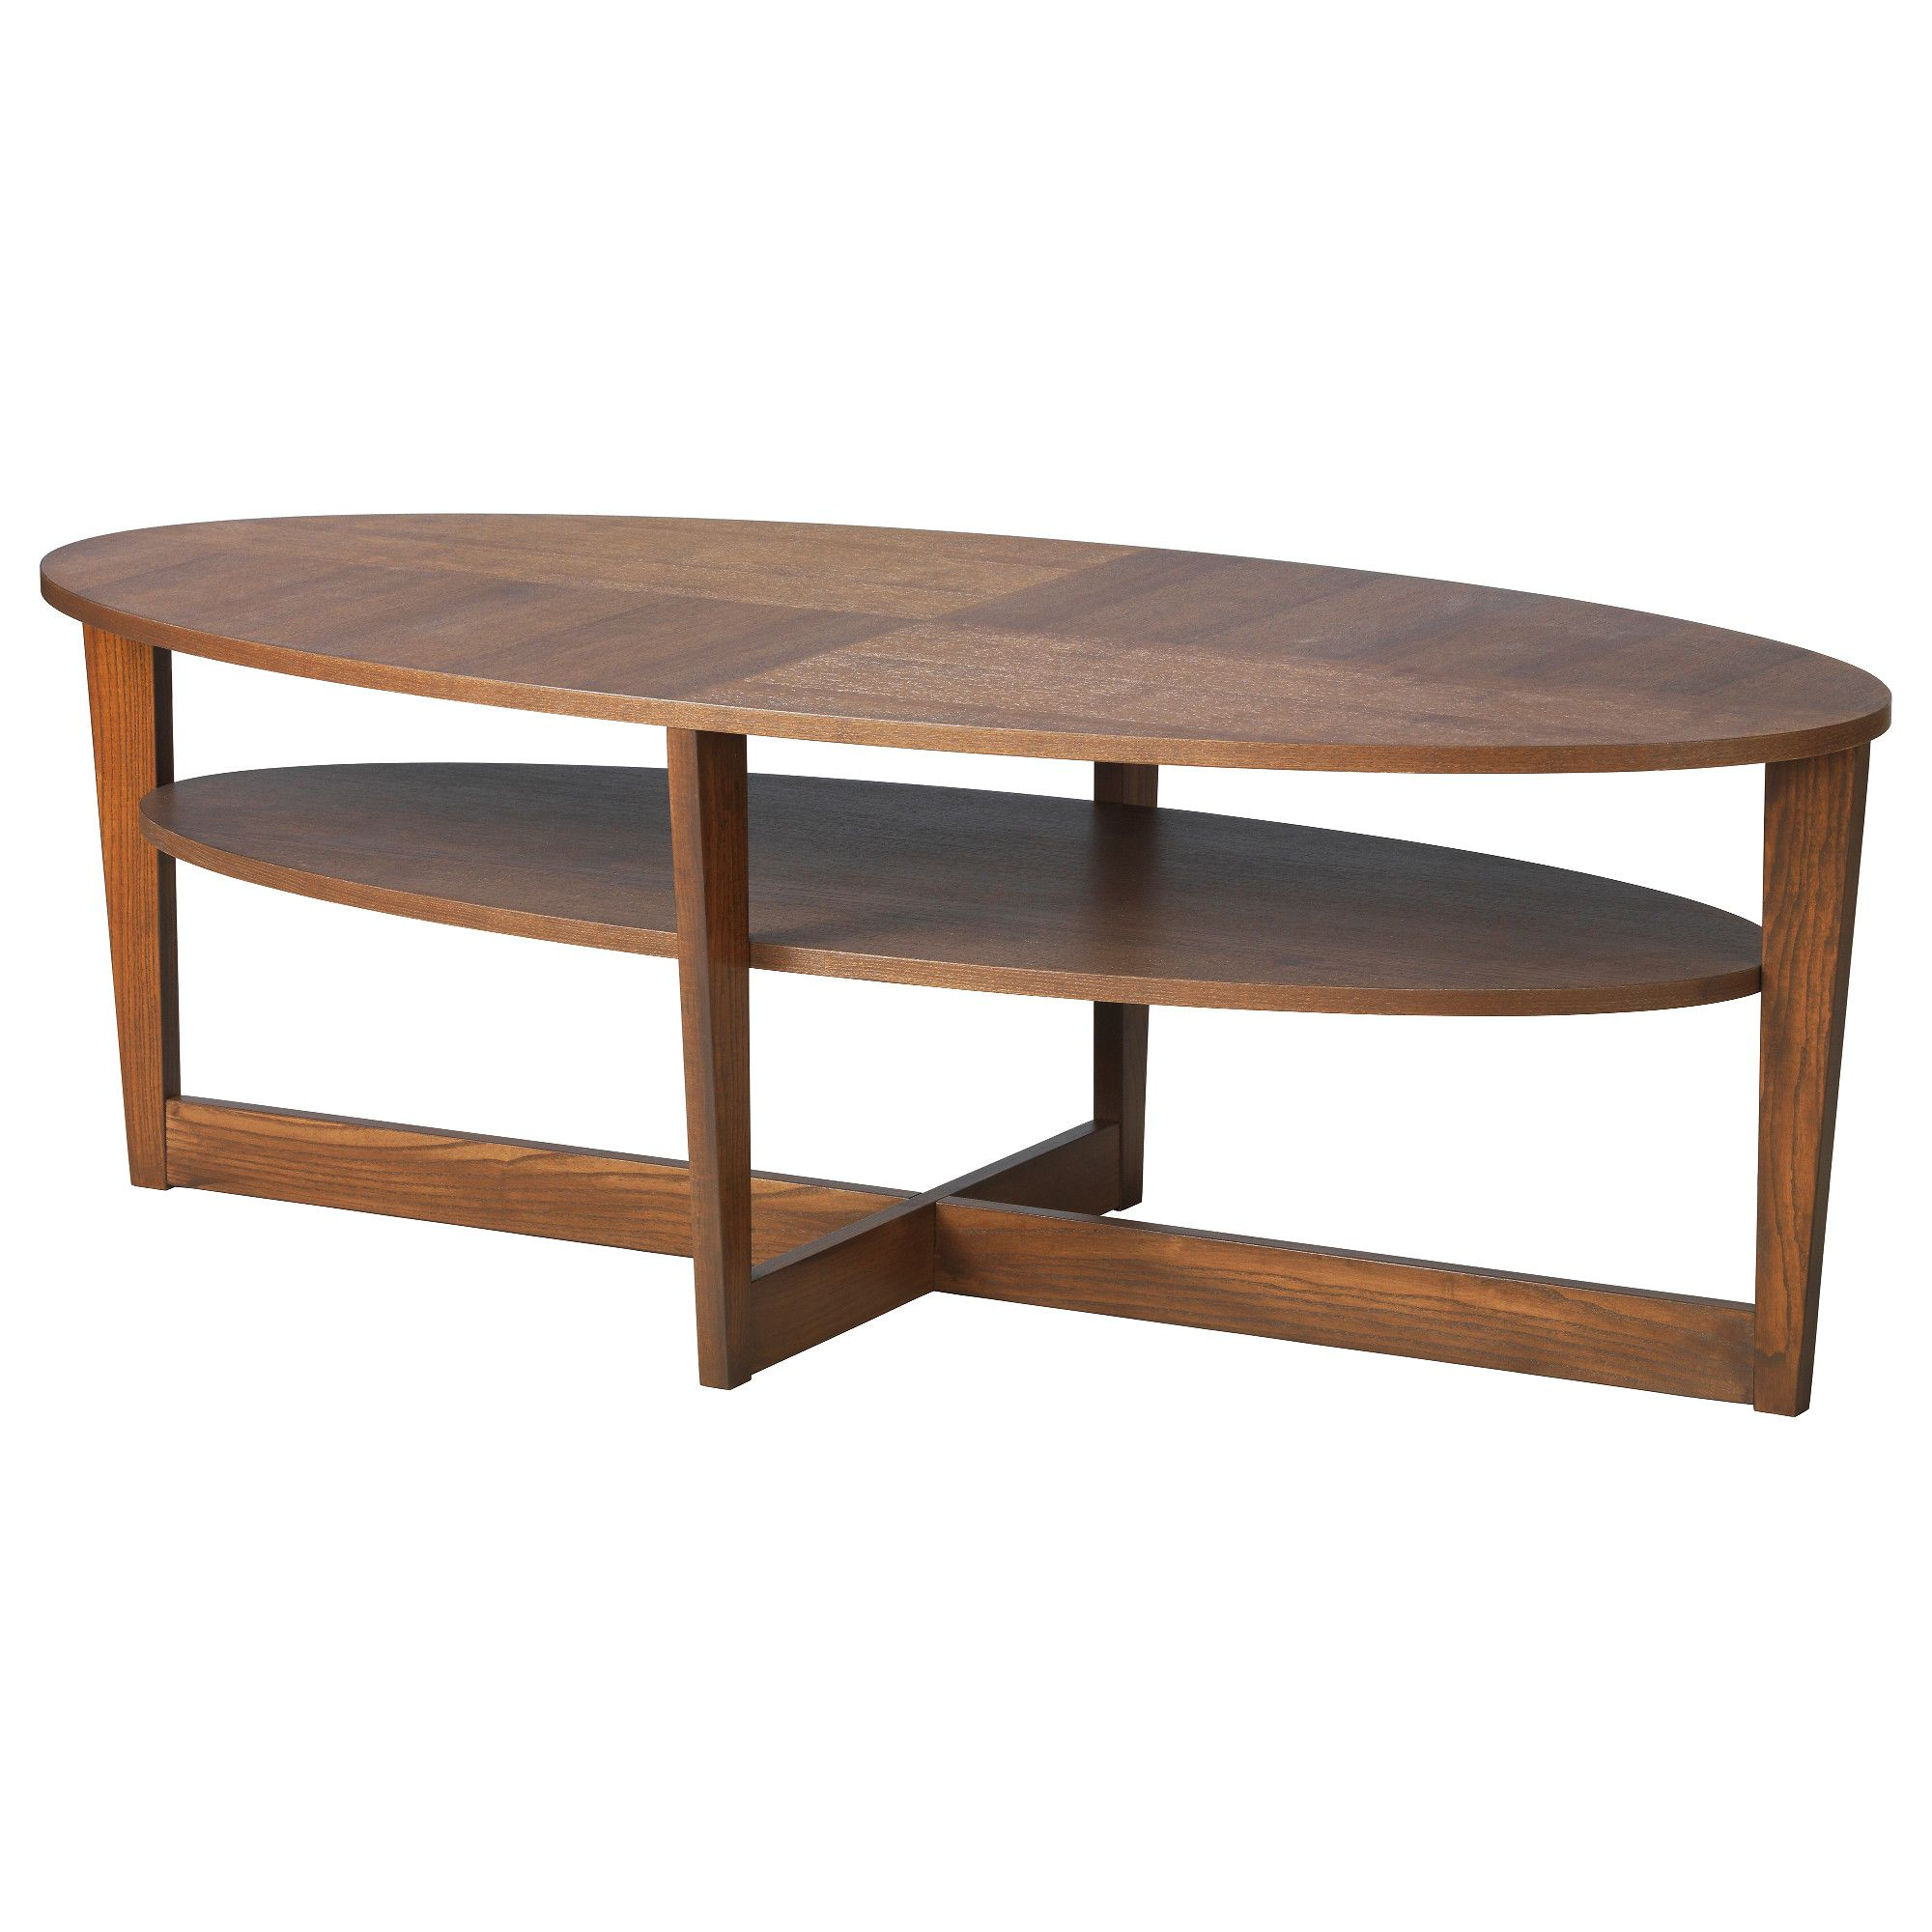 Home Furniture Store Modern Furnishings Decor Coffee Table Ikea Coffee Table At Home Furniture Store [ 2000 x 2000 Pixel ]